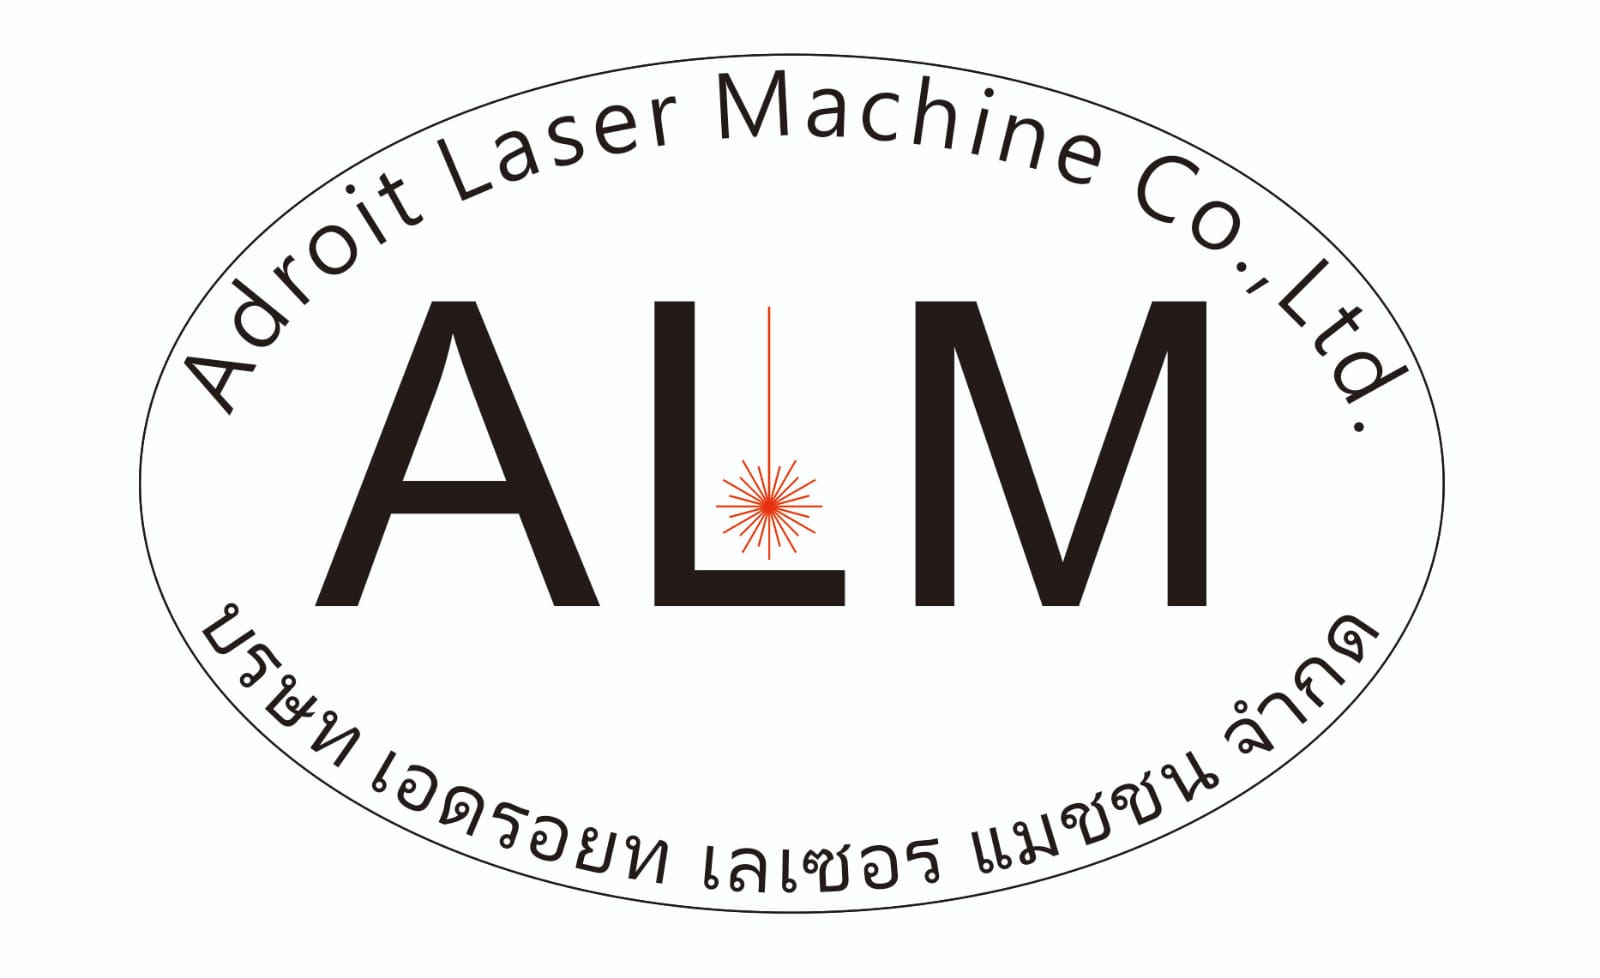 1-ADROIT-LASER-MACHINES-LOGO-REG jpg jpeg